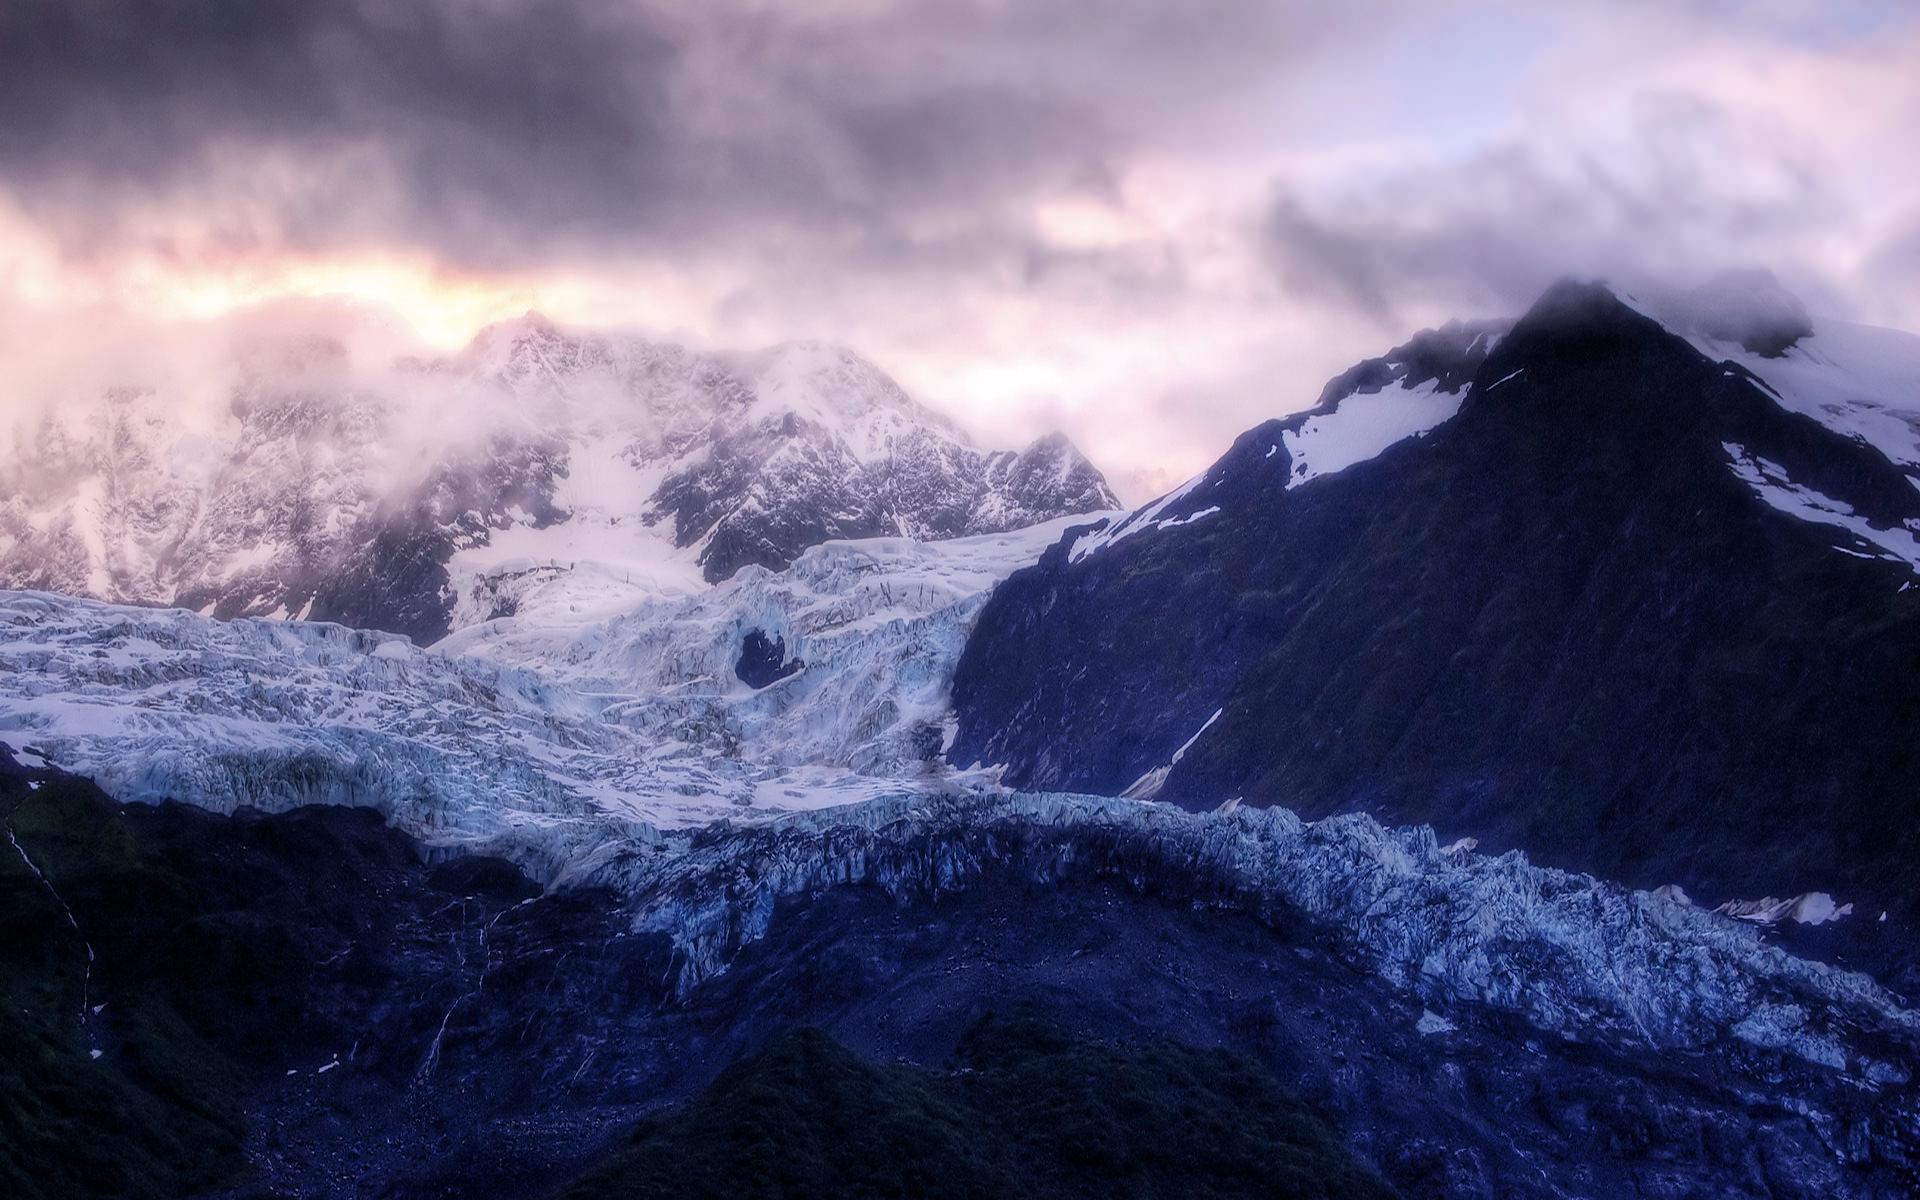 Winter Mountain Wallpaper 1920x1200 1920x1200